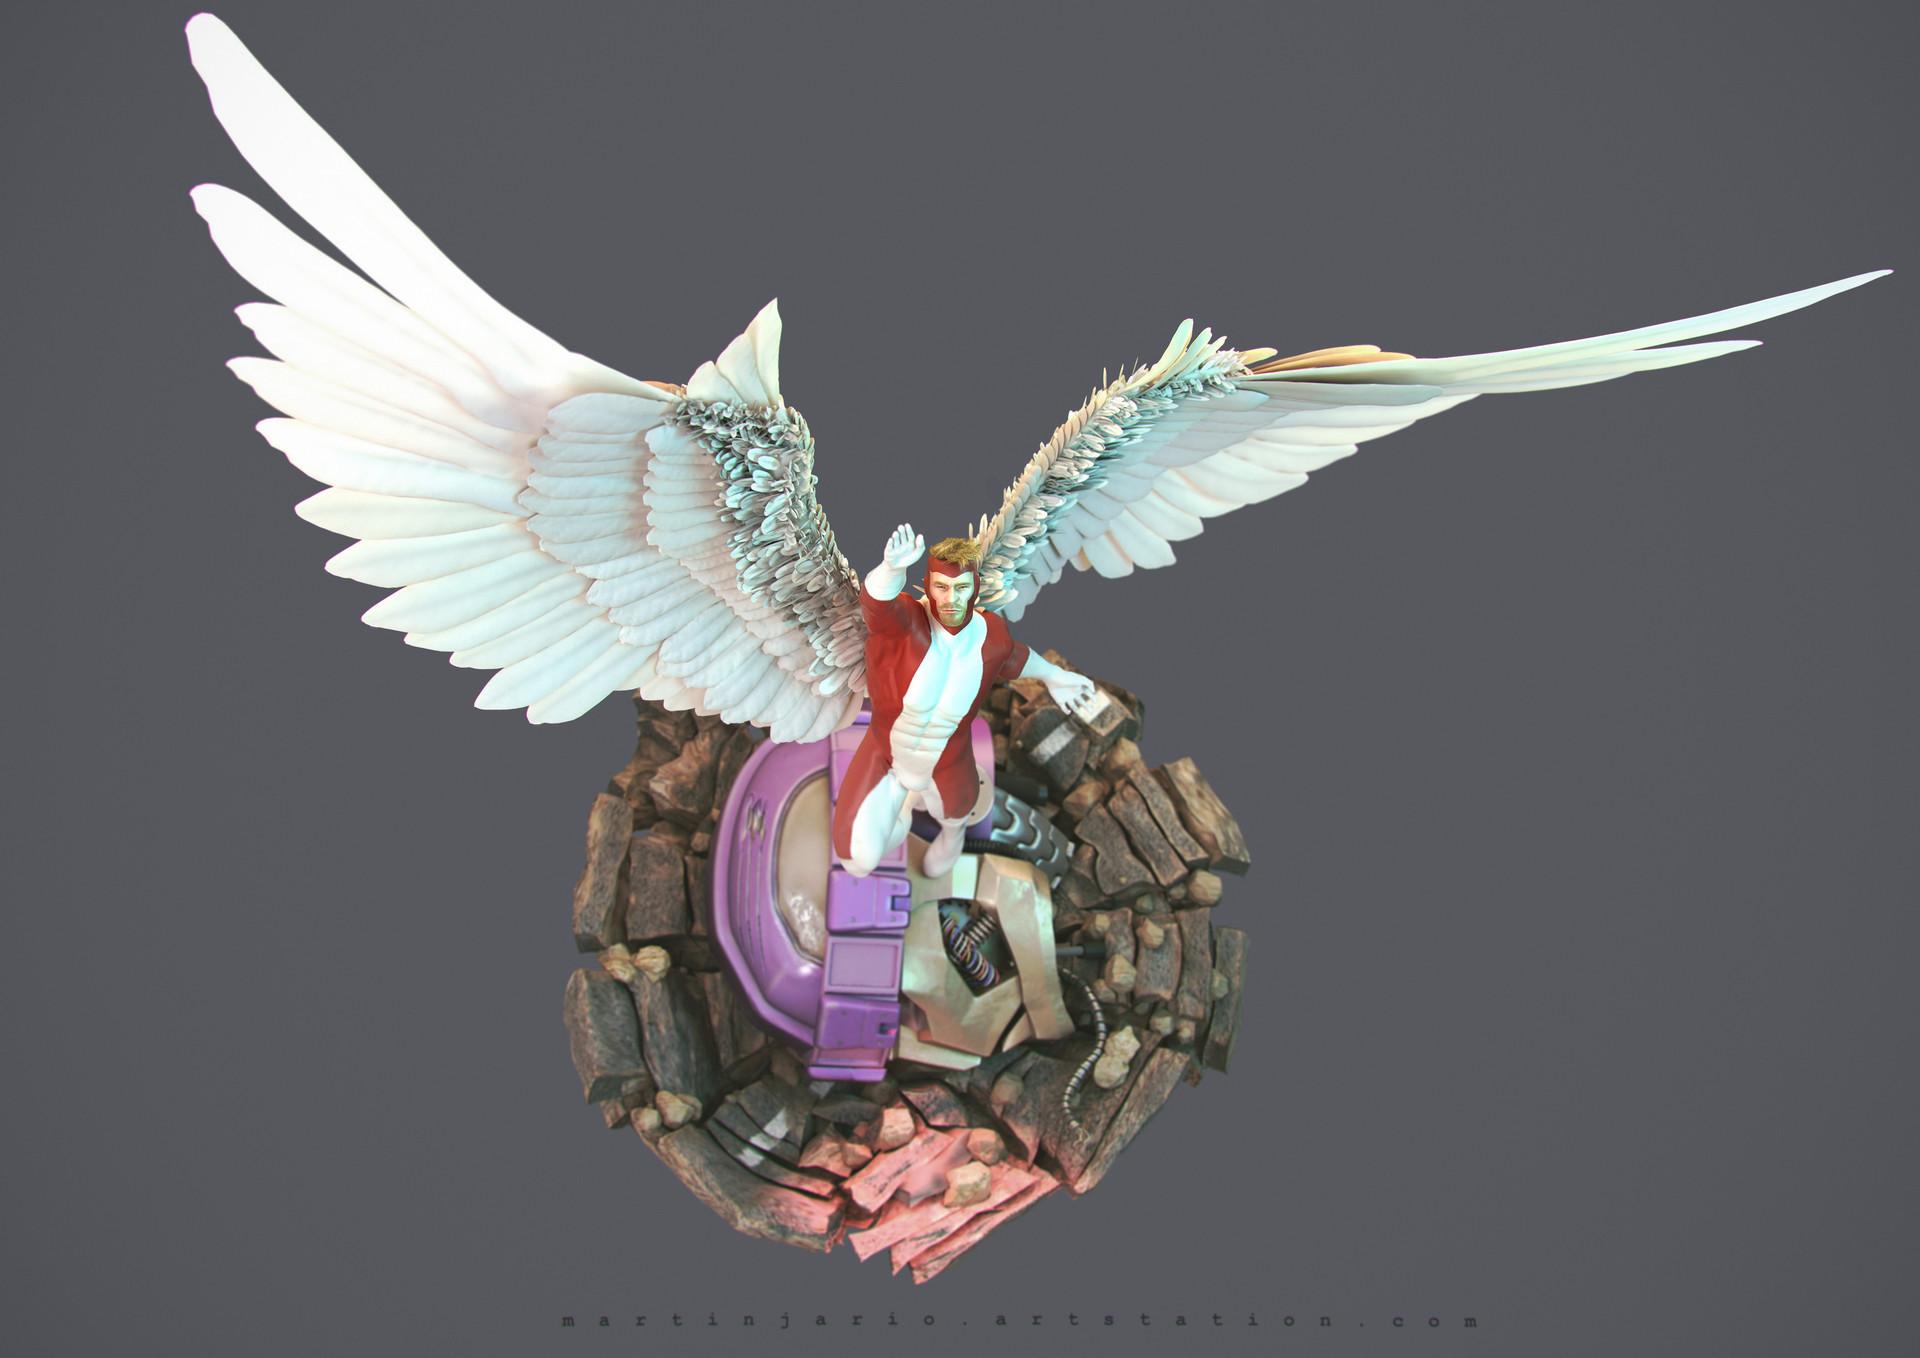 Martin jario martinjario angel xmen zbrush top 2